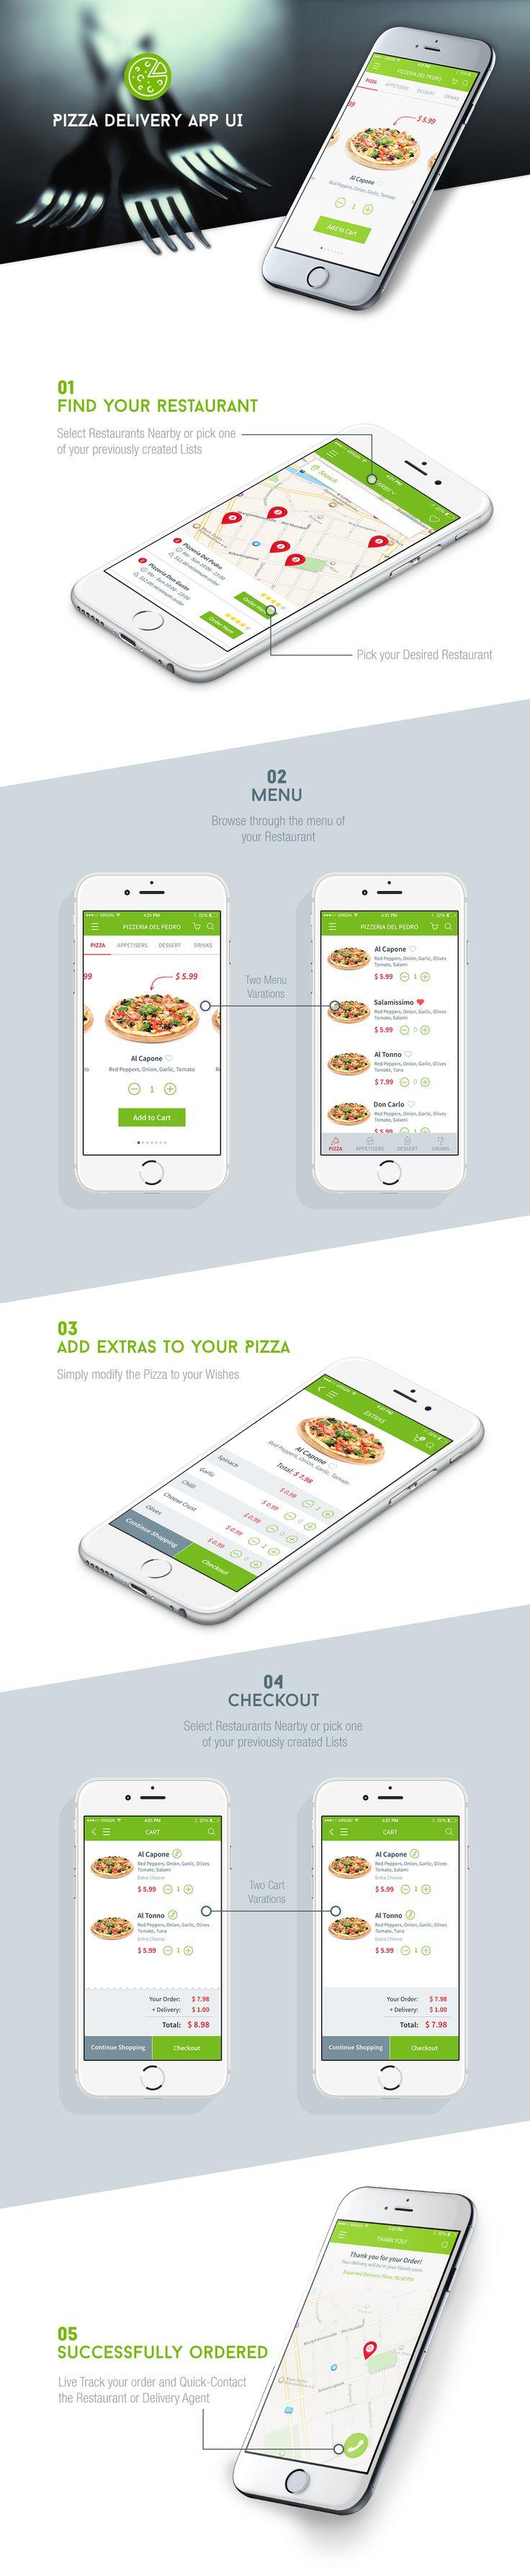 Pizza Delivery #app #ui #design